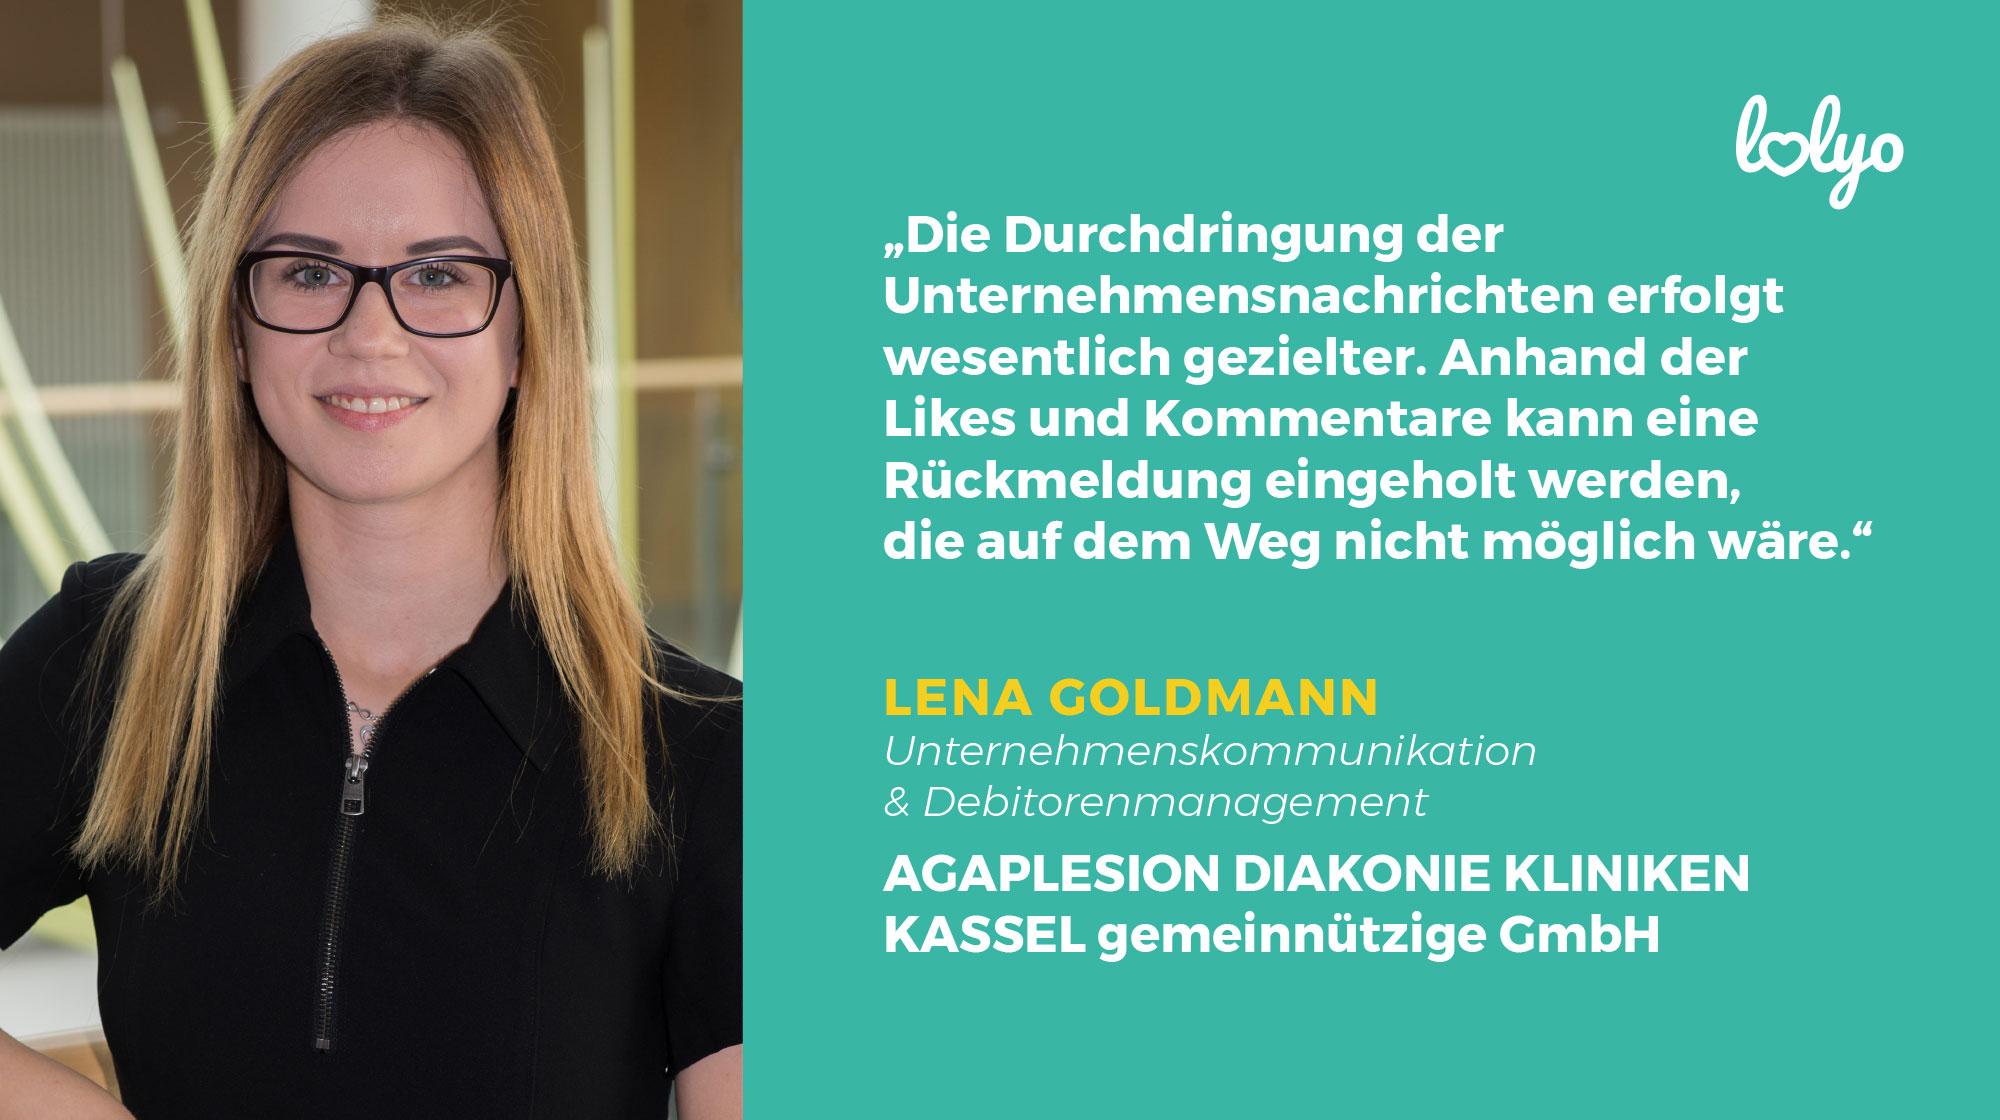 Frau Lena Goldmann, AGAPLESION DIAKONIE KLINIKEN KASSEL - Bild mit Zitat: